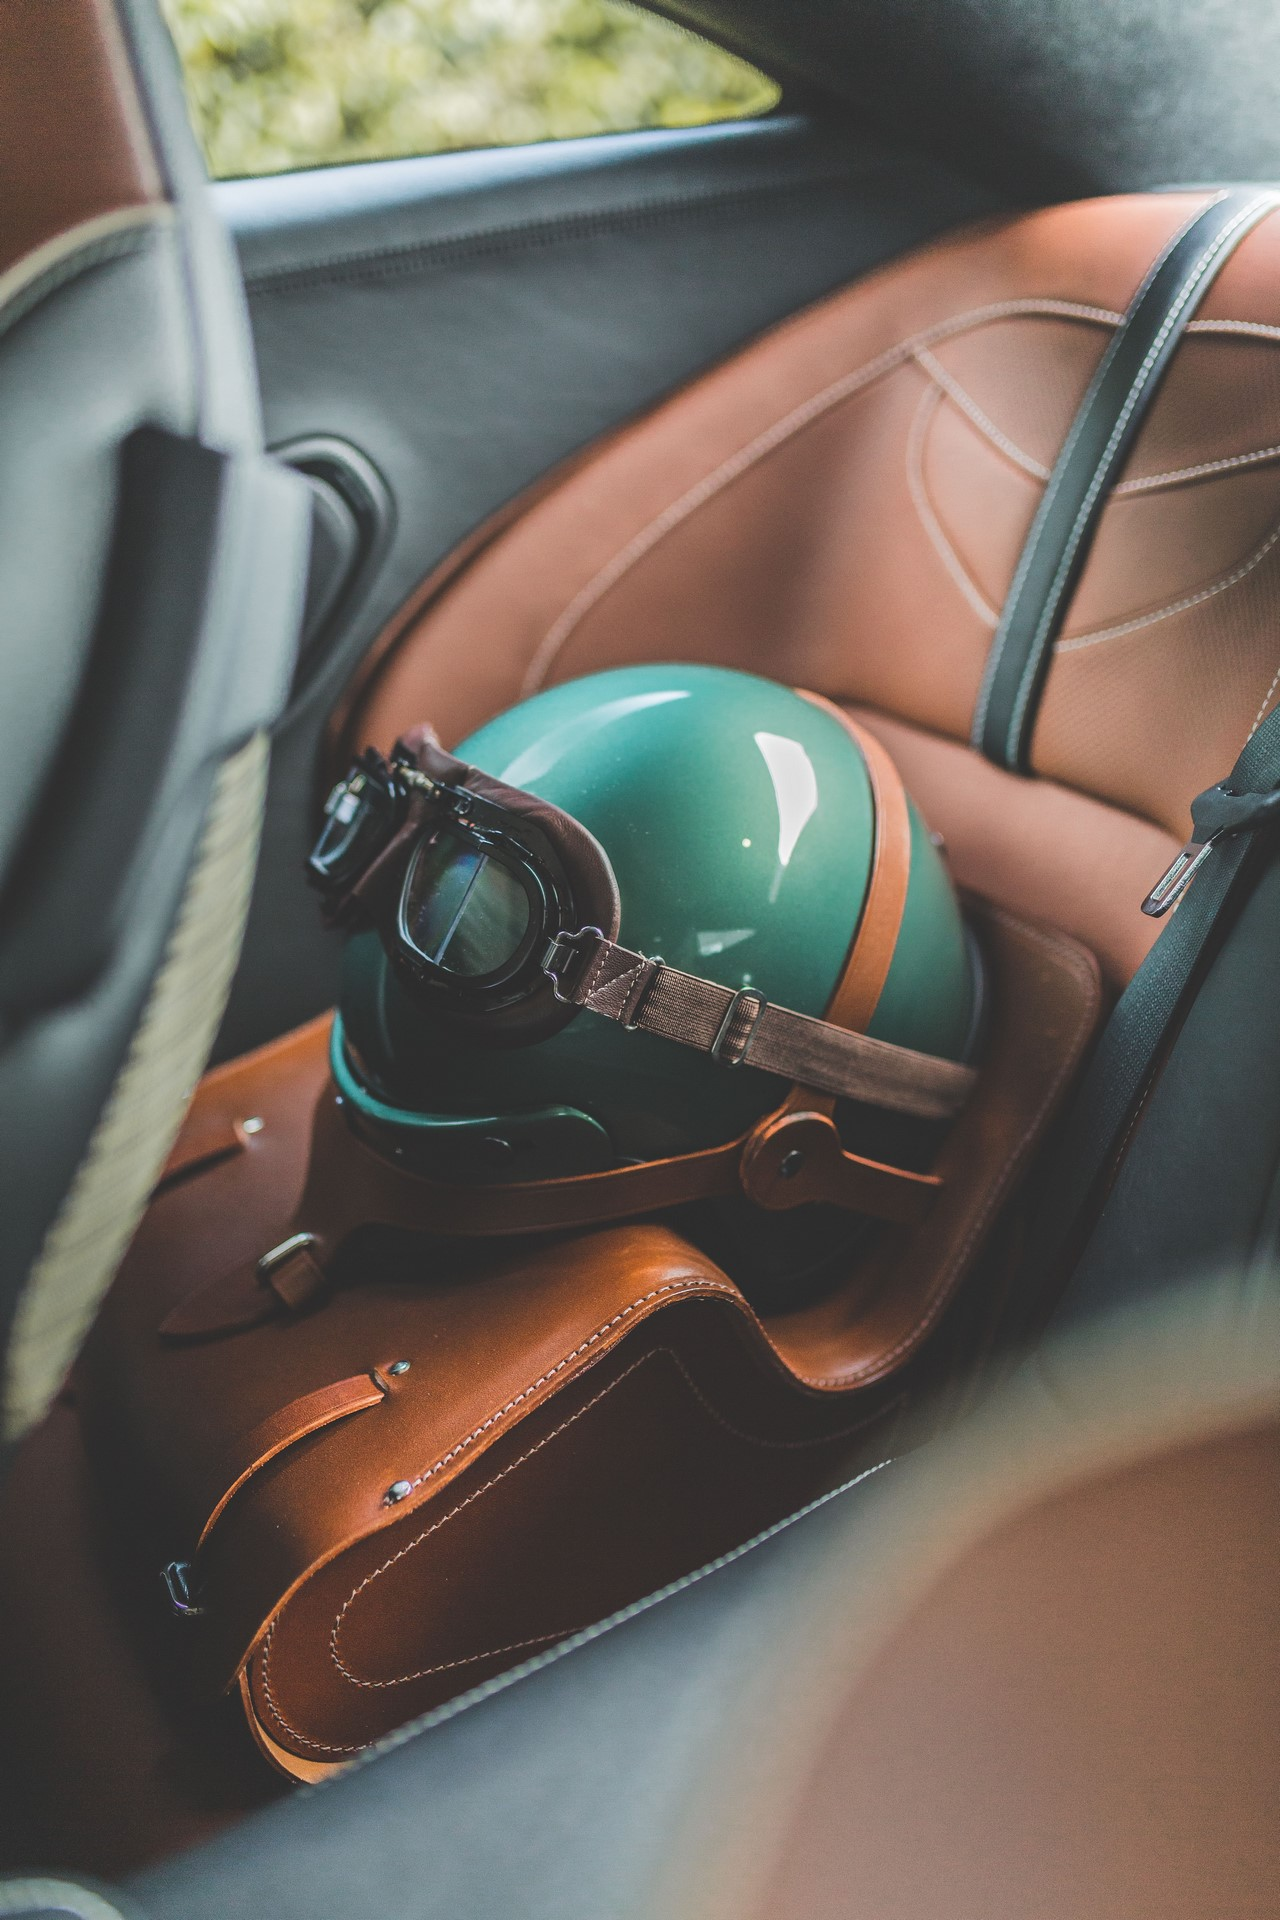 Aston-Martin-DBS-59-Edition-6